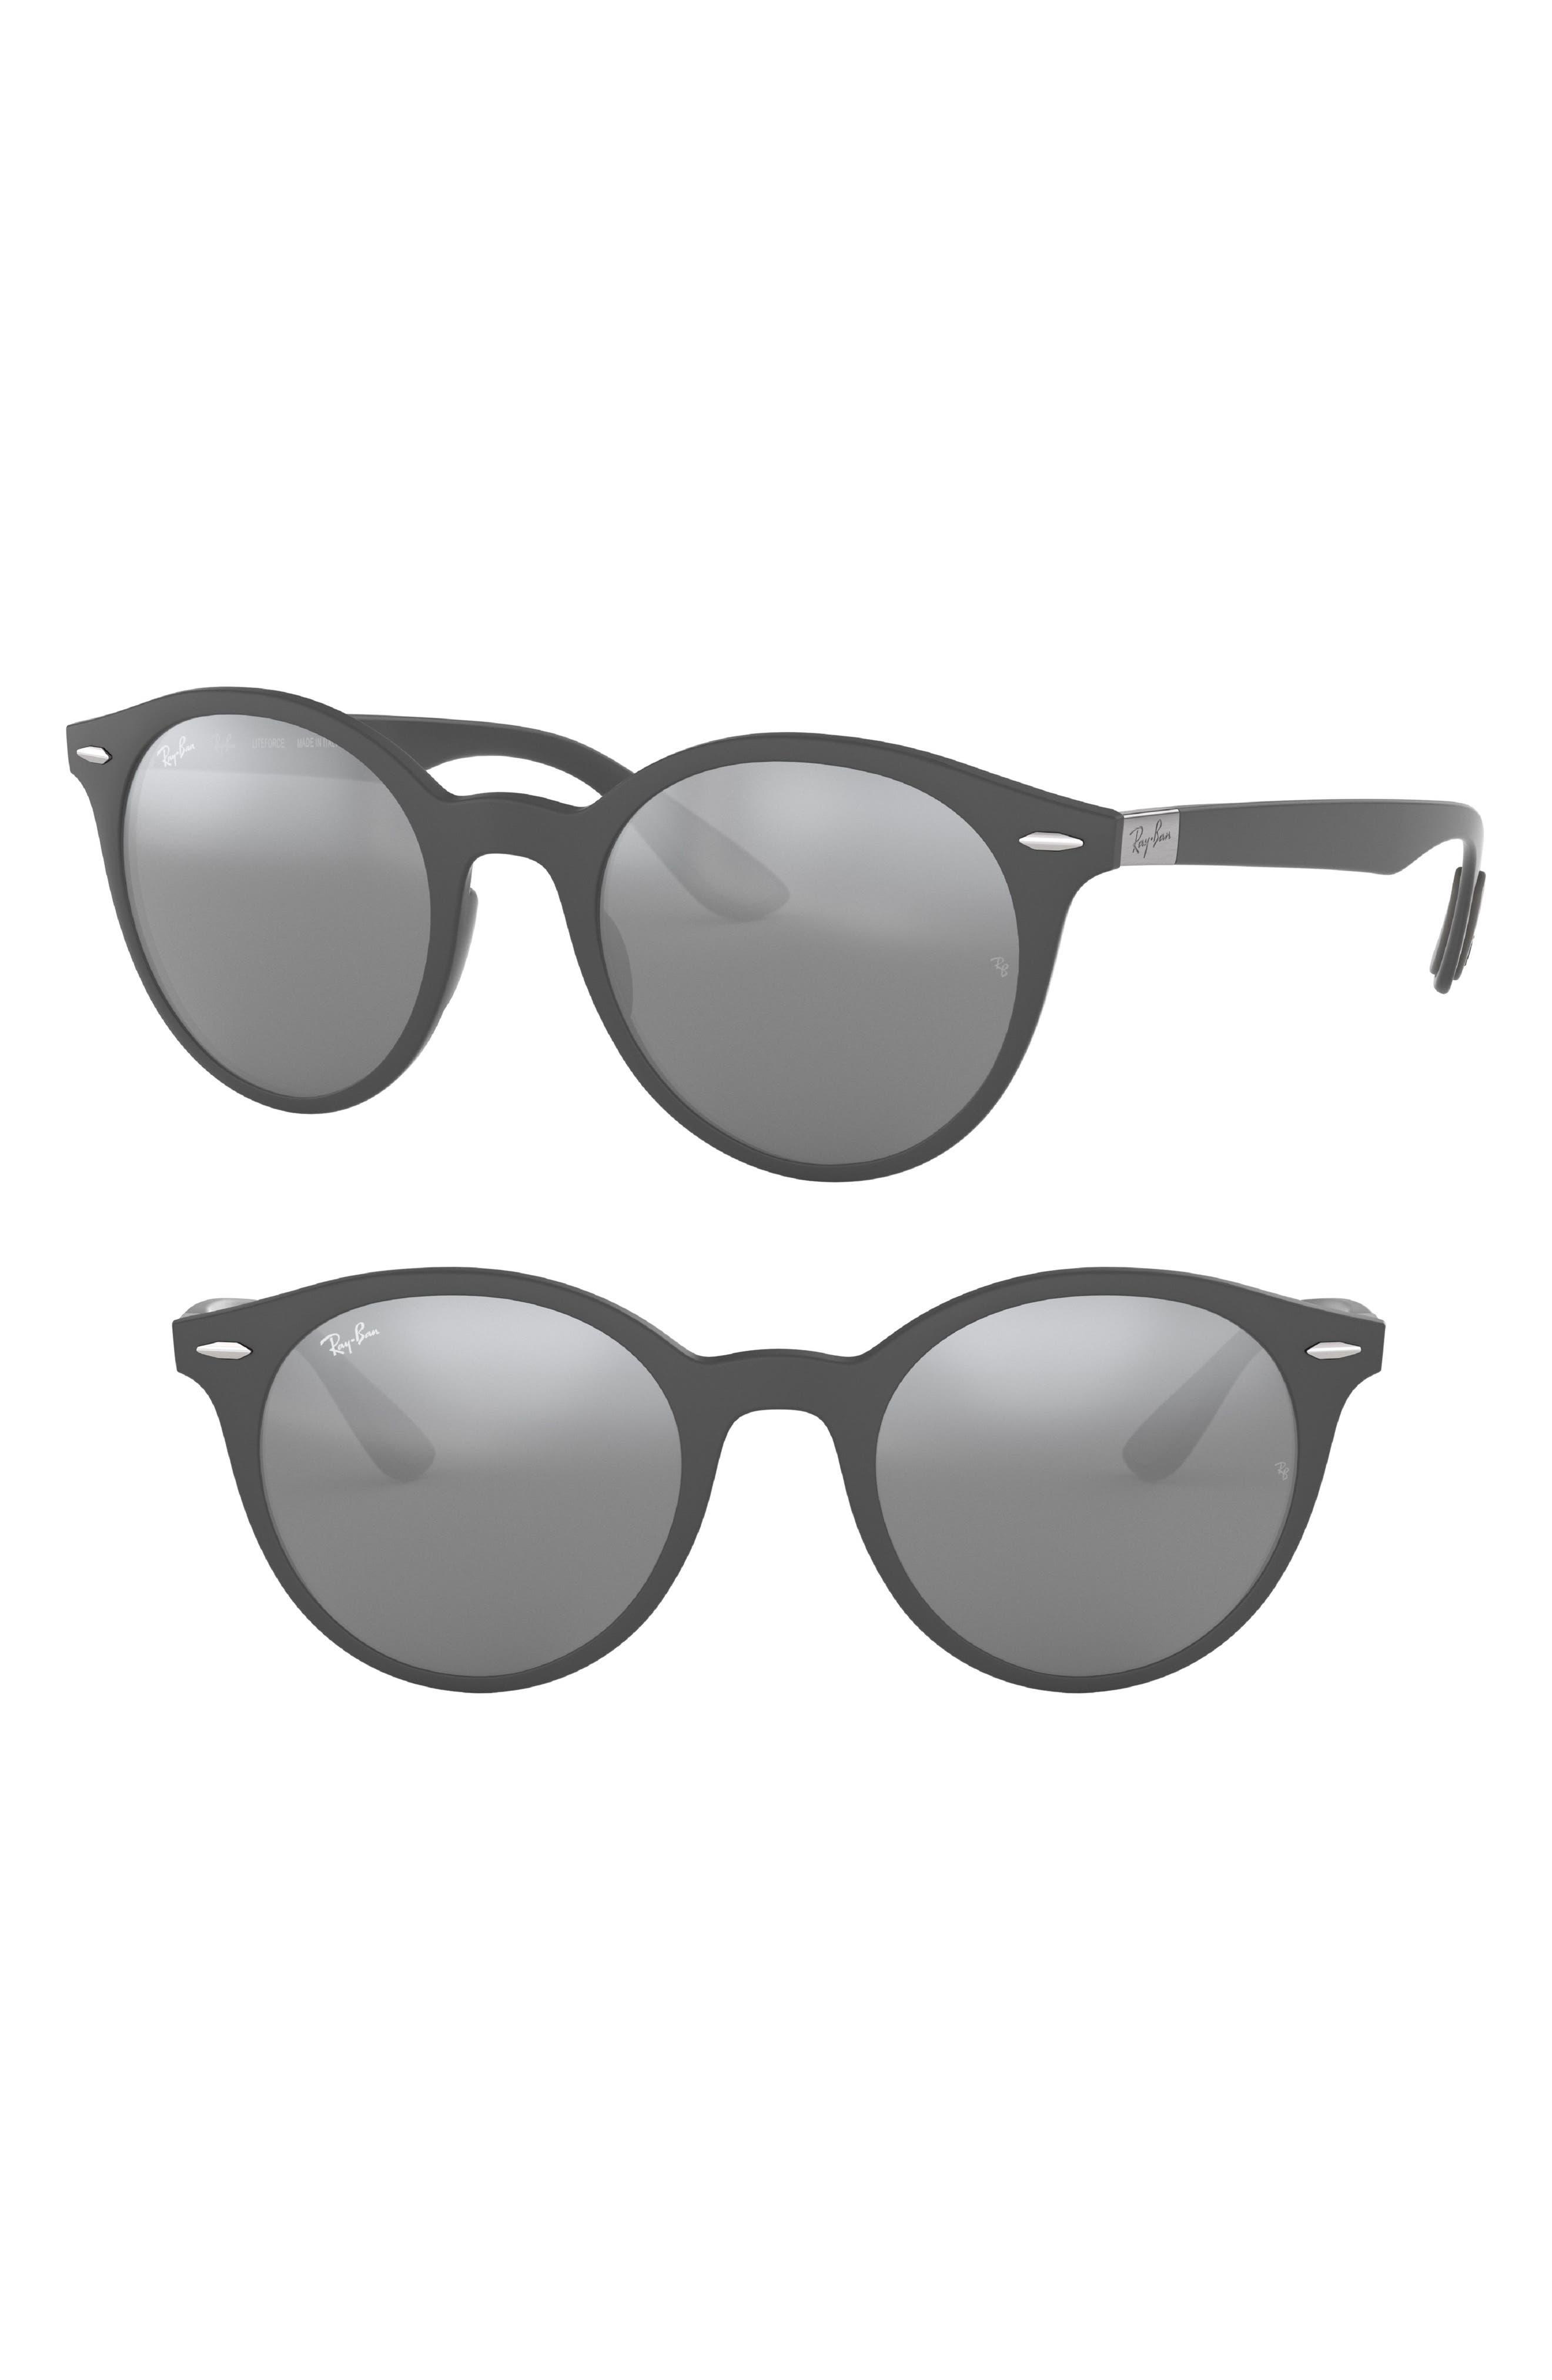 Phantos 50mm Mirrored Sunglasses,                             Main thumbnail 1, color,                             Dark Grey